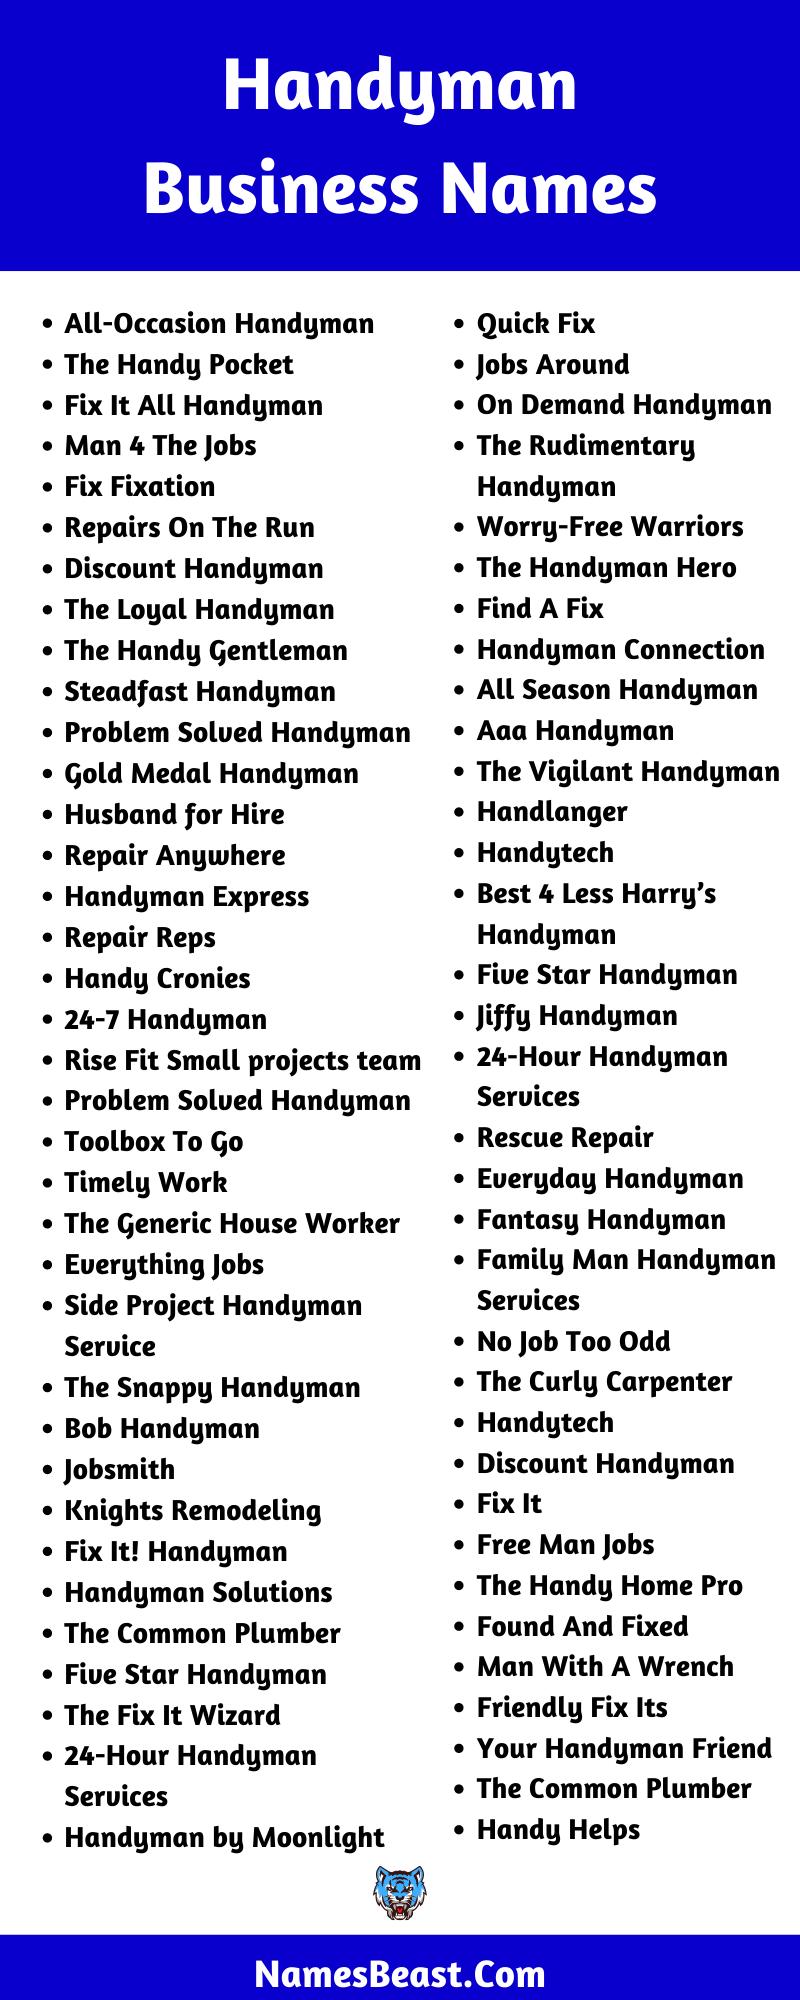 Handyman Business Name Ideas